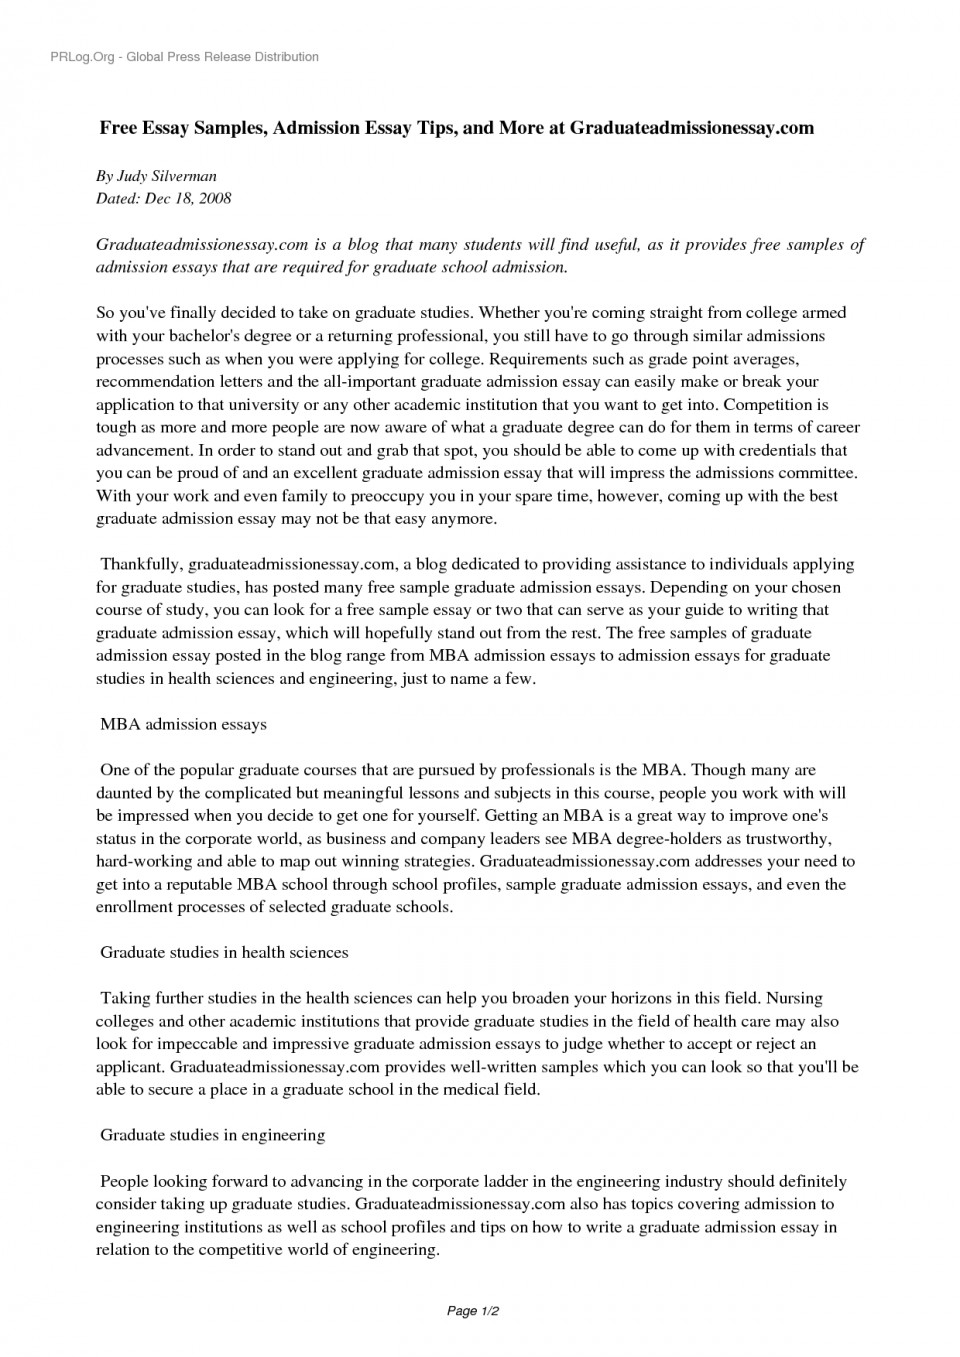 001 Yhn3ns0535 Free Sample Essay For Graduate School Admission Formidable Pdf 960